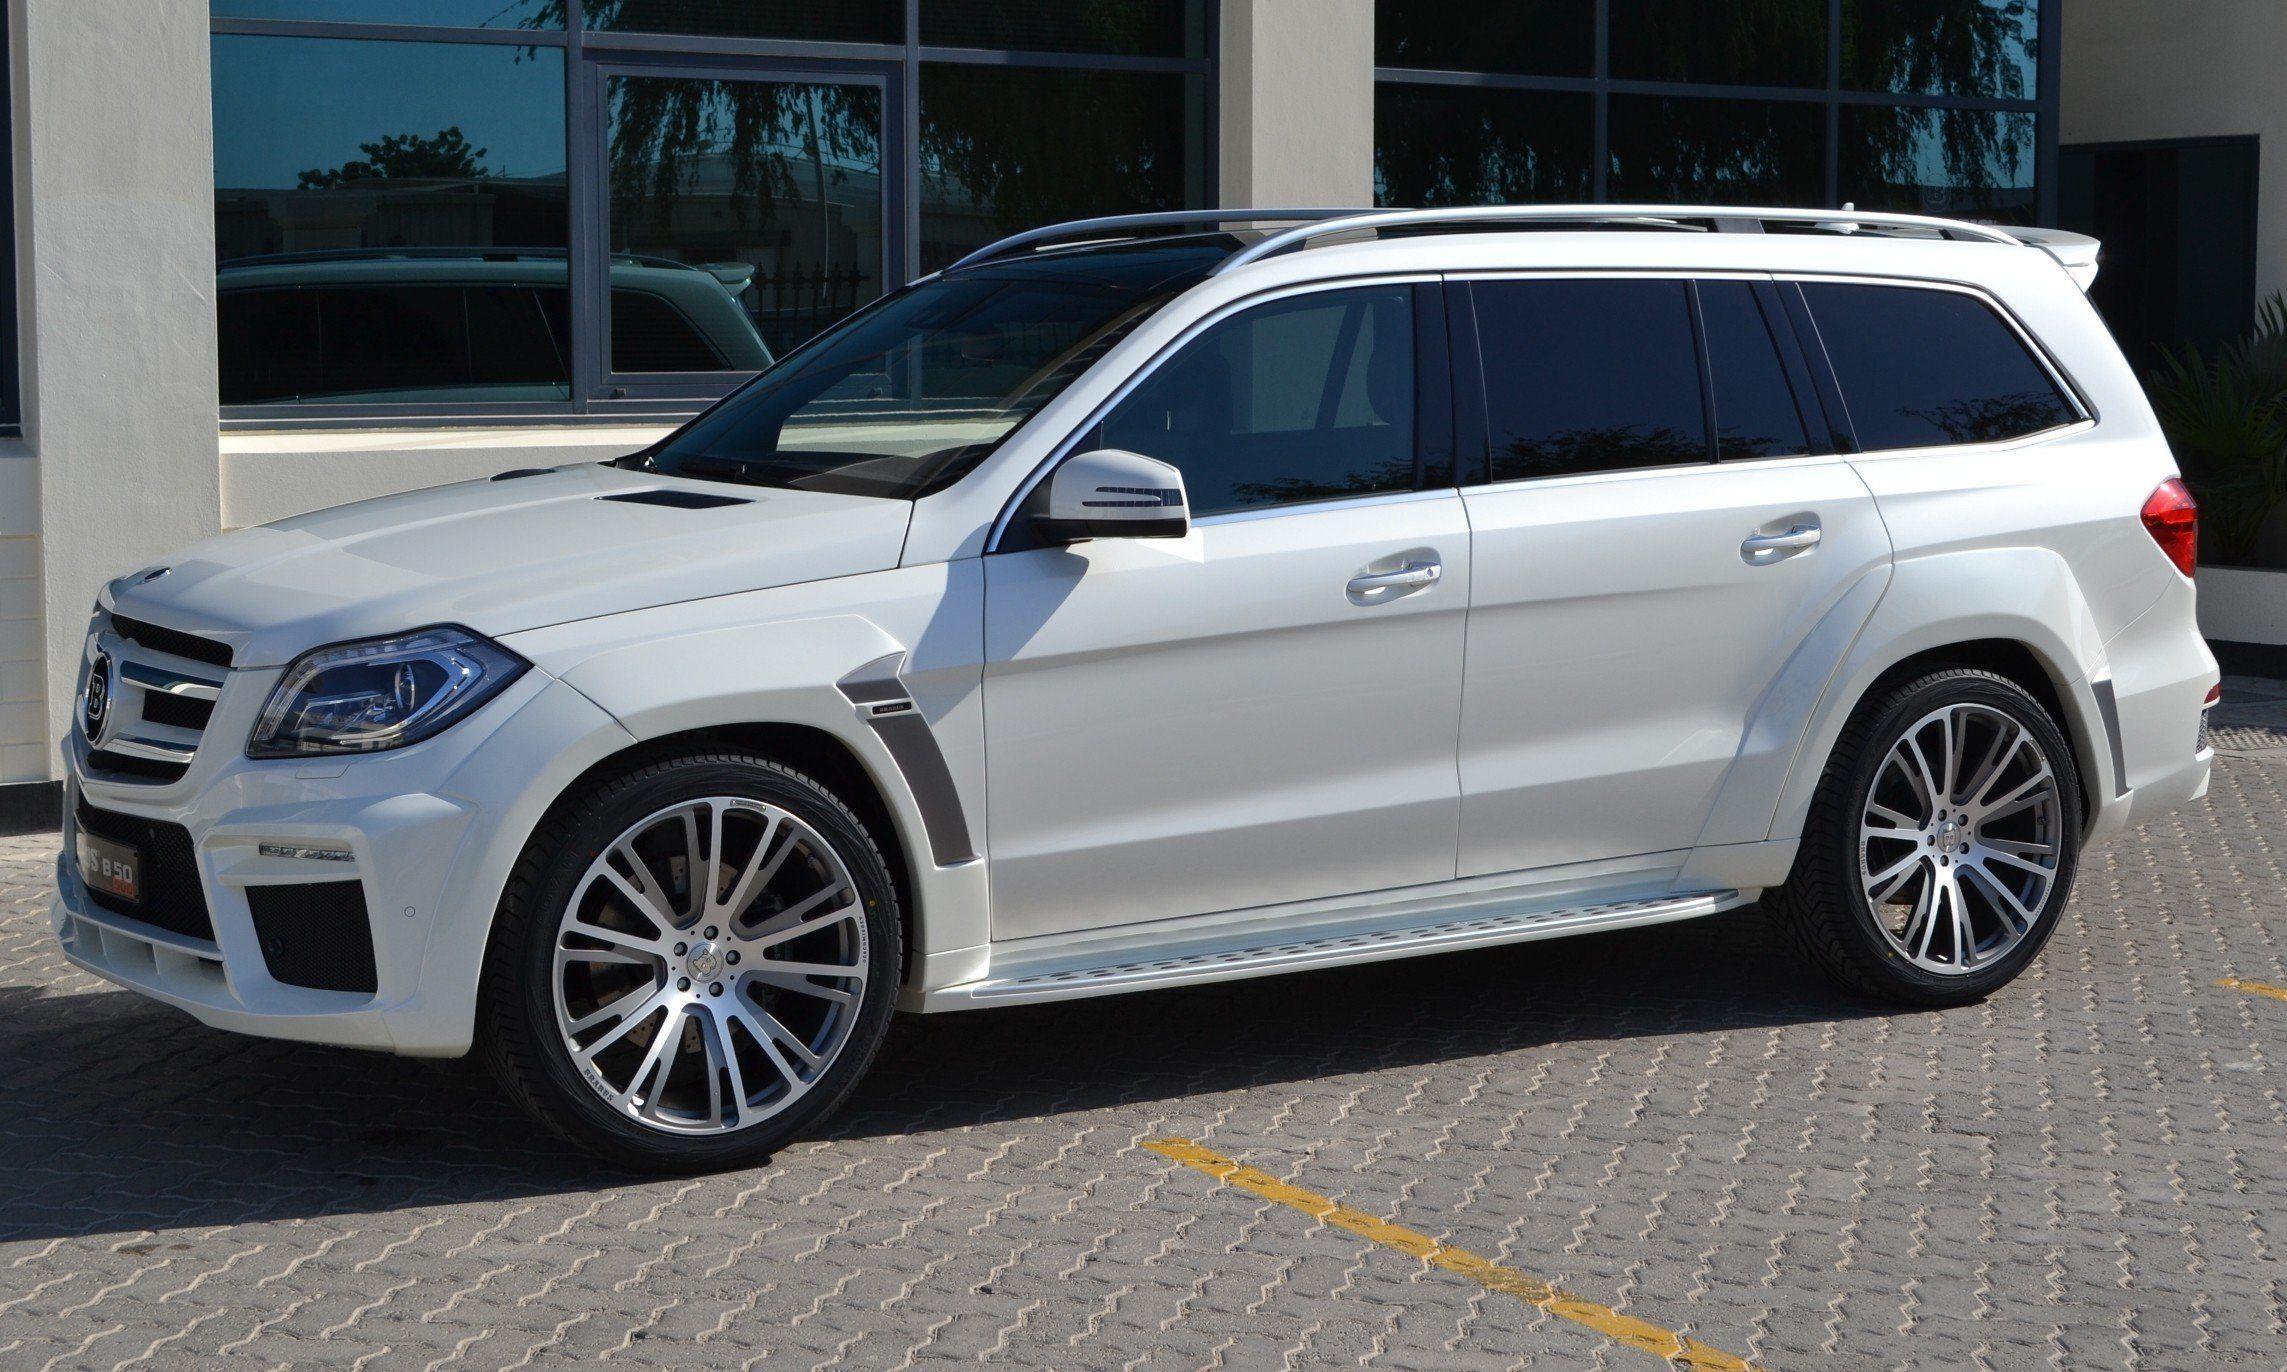 BRABUS-B63S-700-Widestar-Upgrades-for-Mercedes-Benz-GL ...